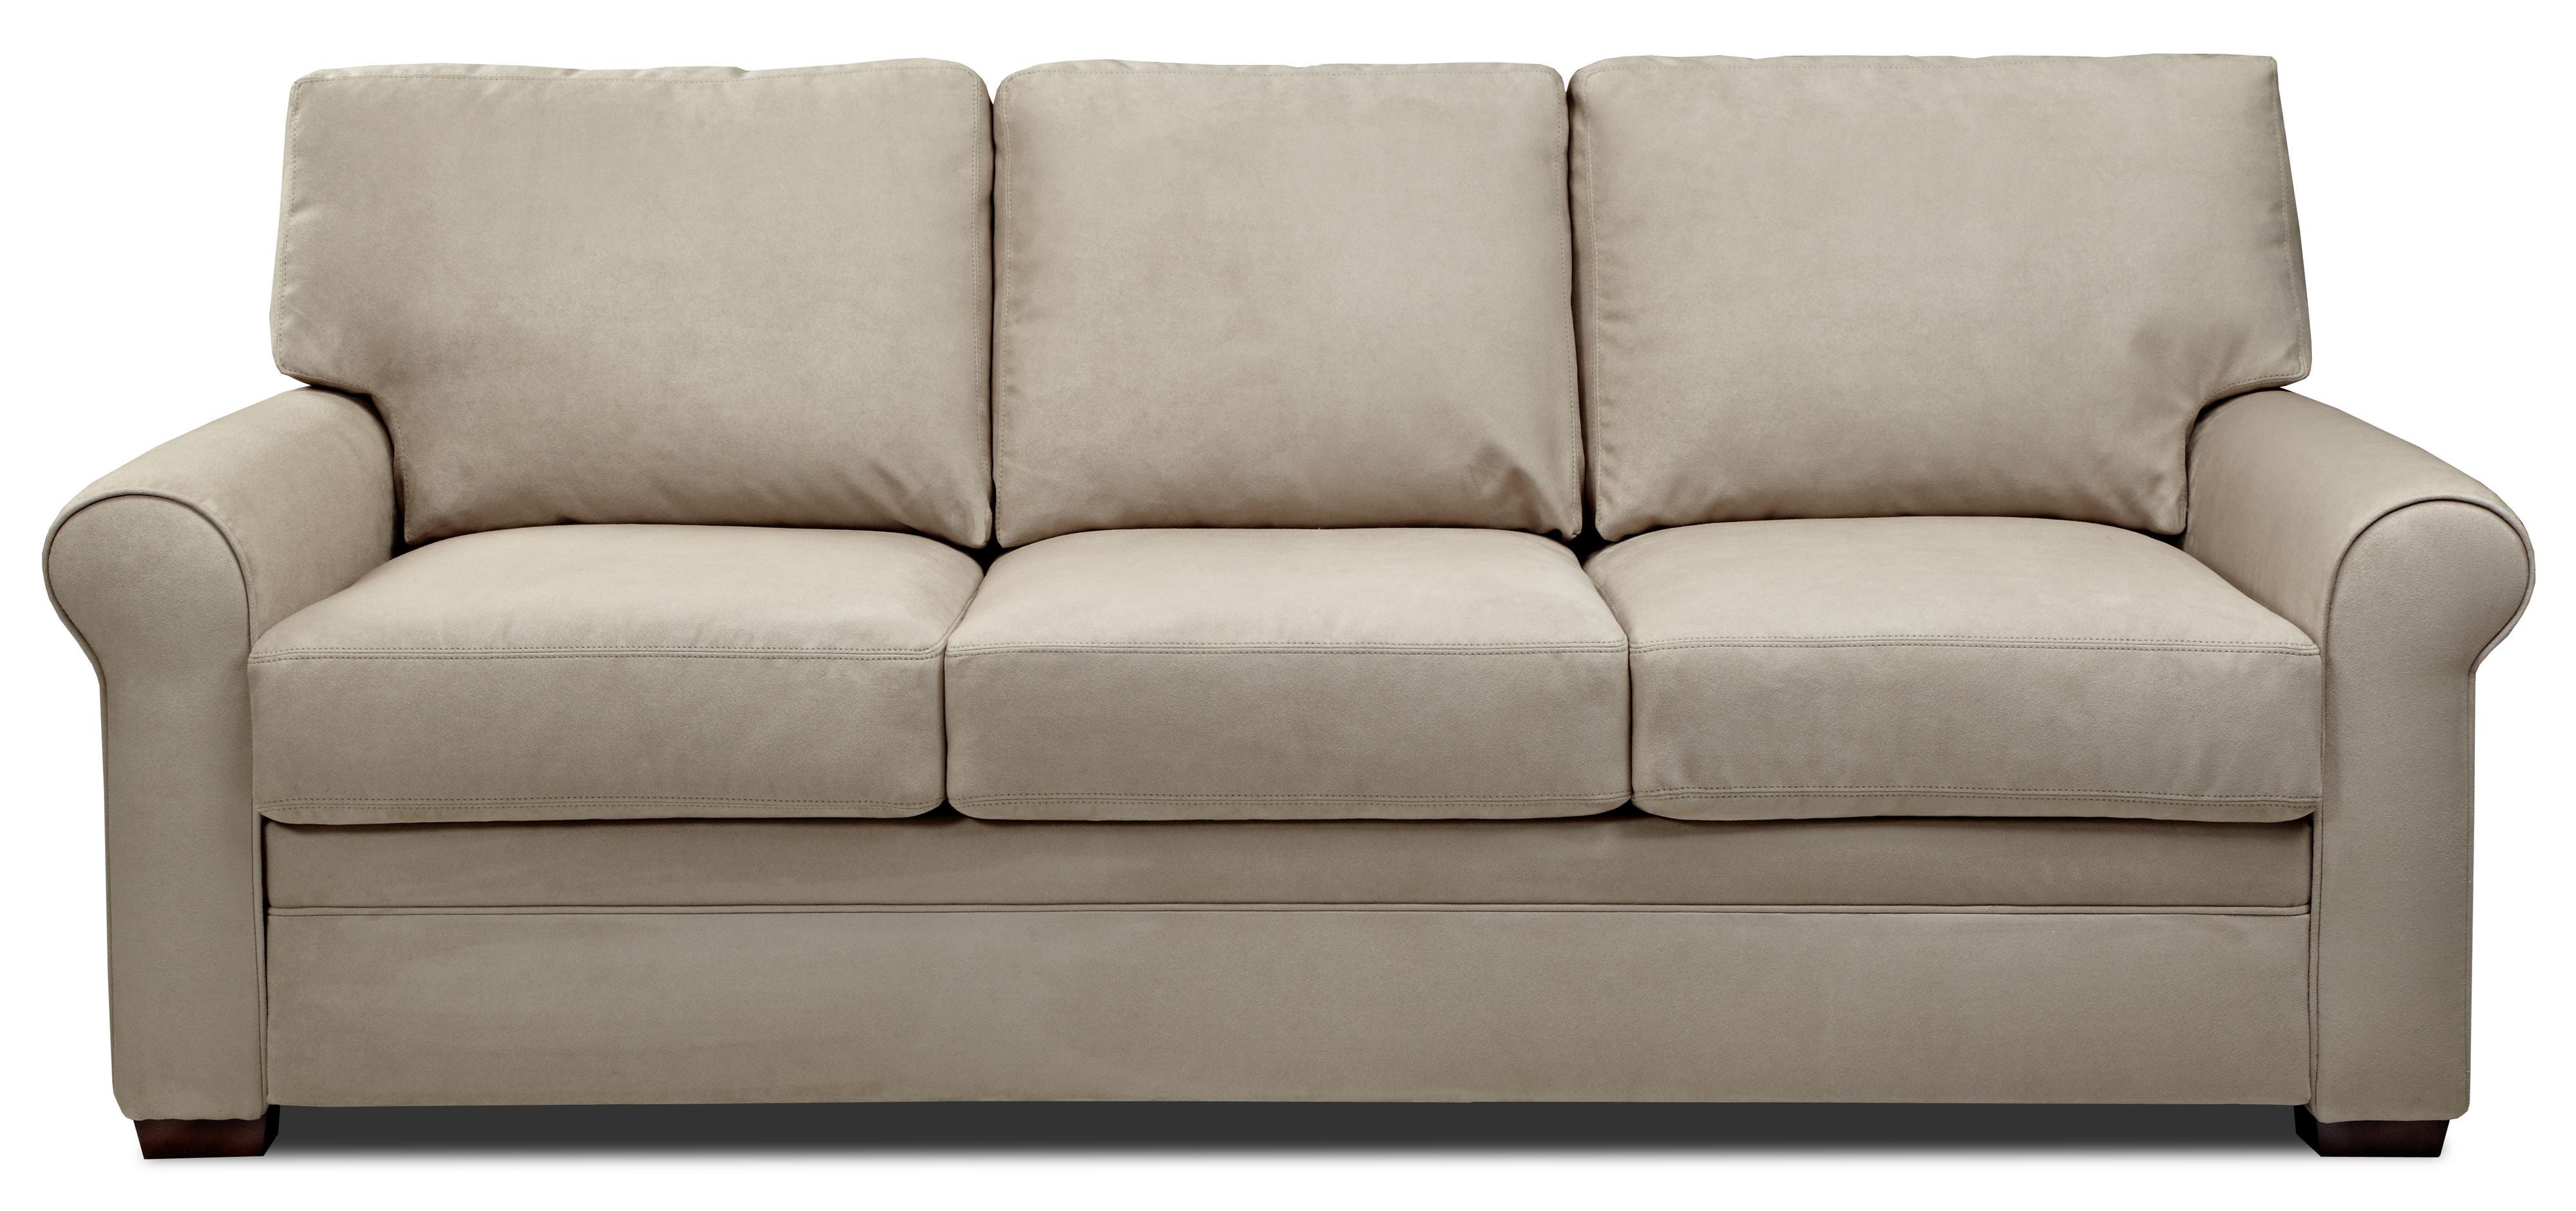 American Leather Comfort Sleeper Gina Queen Plus Sofa Sleeper W